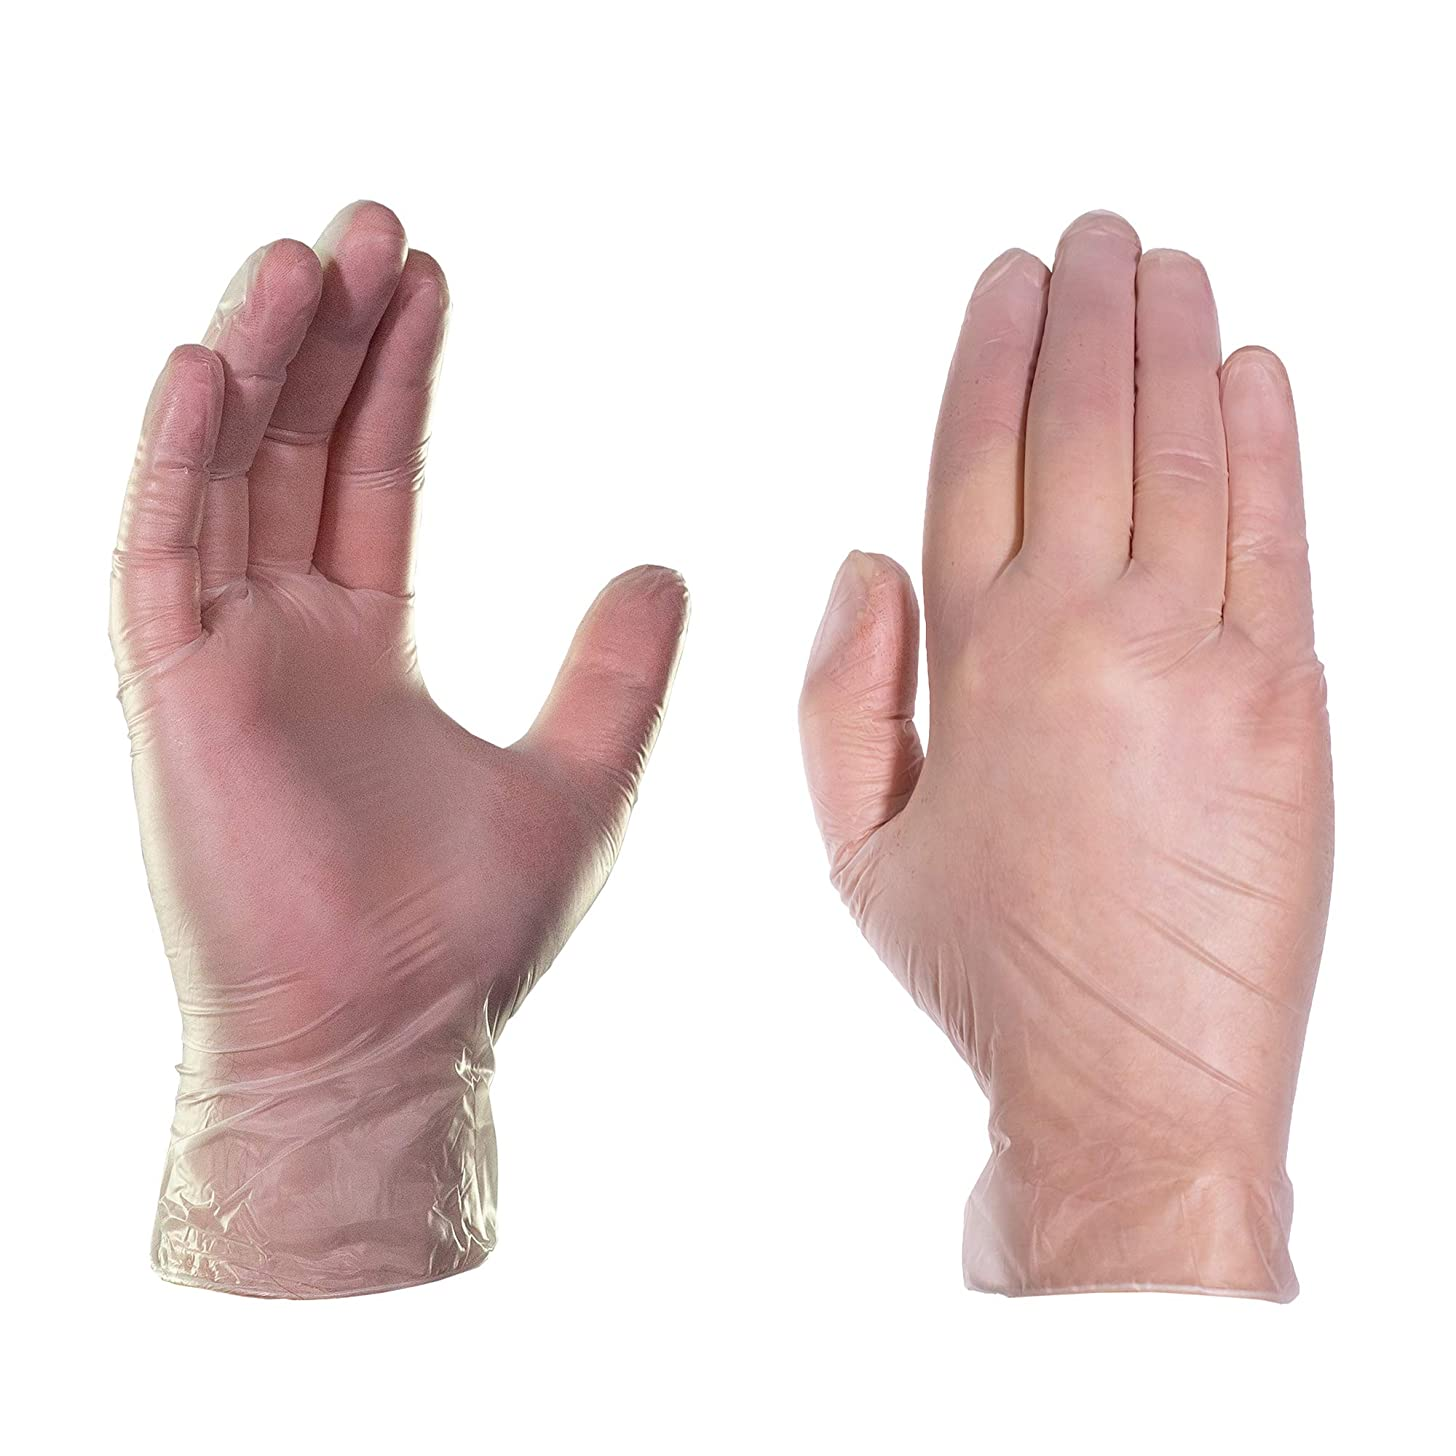 AMMEX Clear Vinyl 3 Mil Disposable Gloves - Powder Free, Latex Free, Ambidextrous, Medium, Box of 200